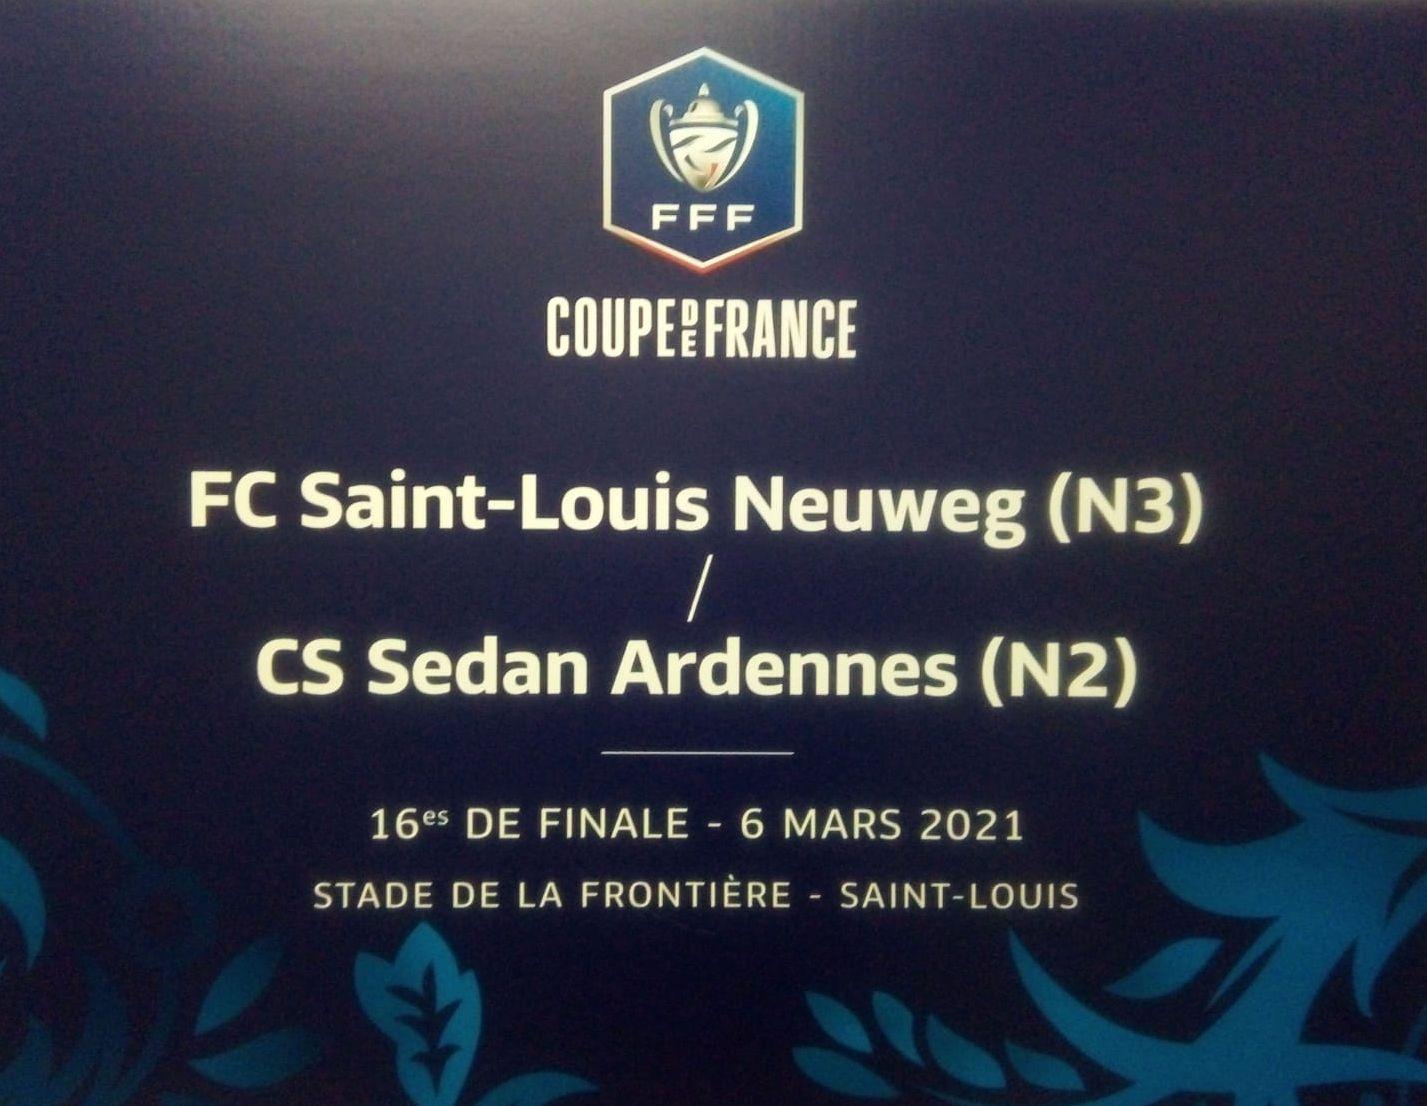 FC Saint-Louis Neuweg  football